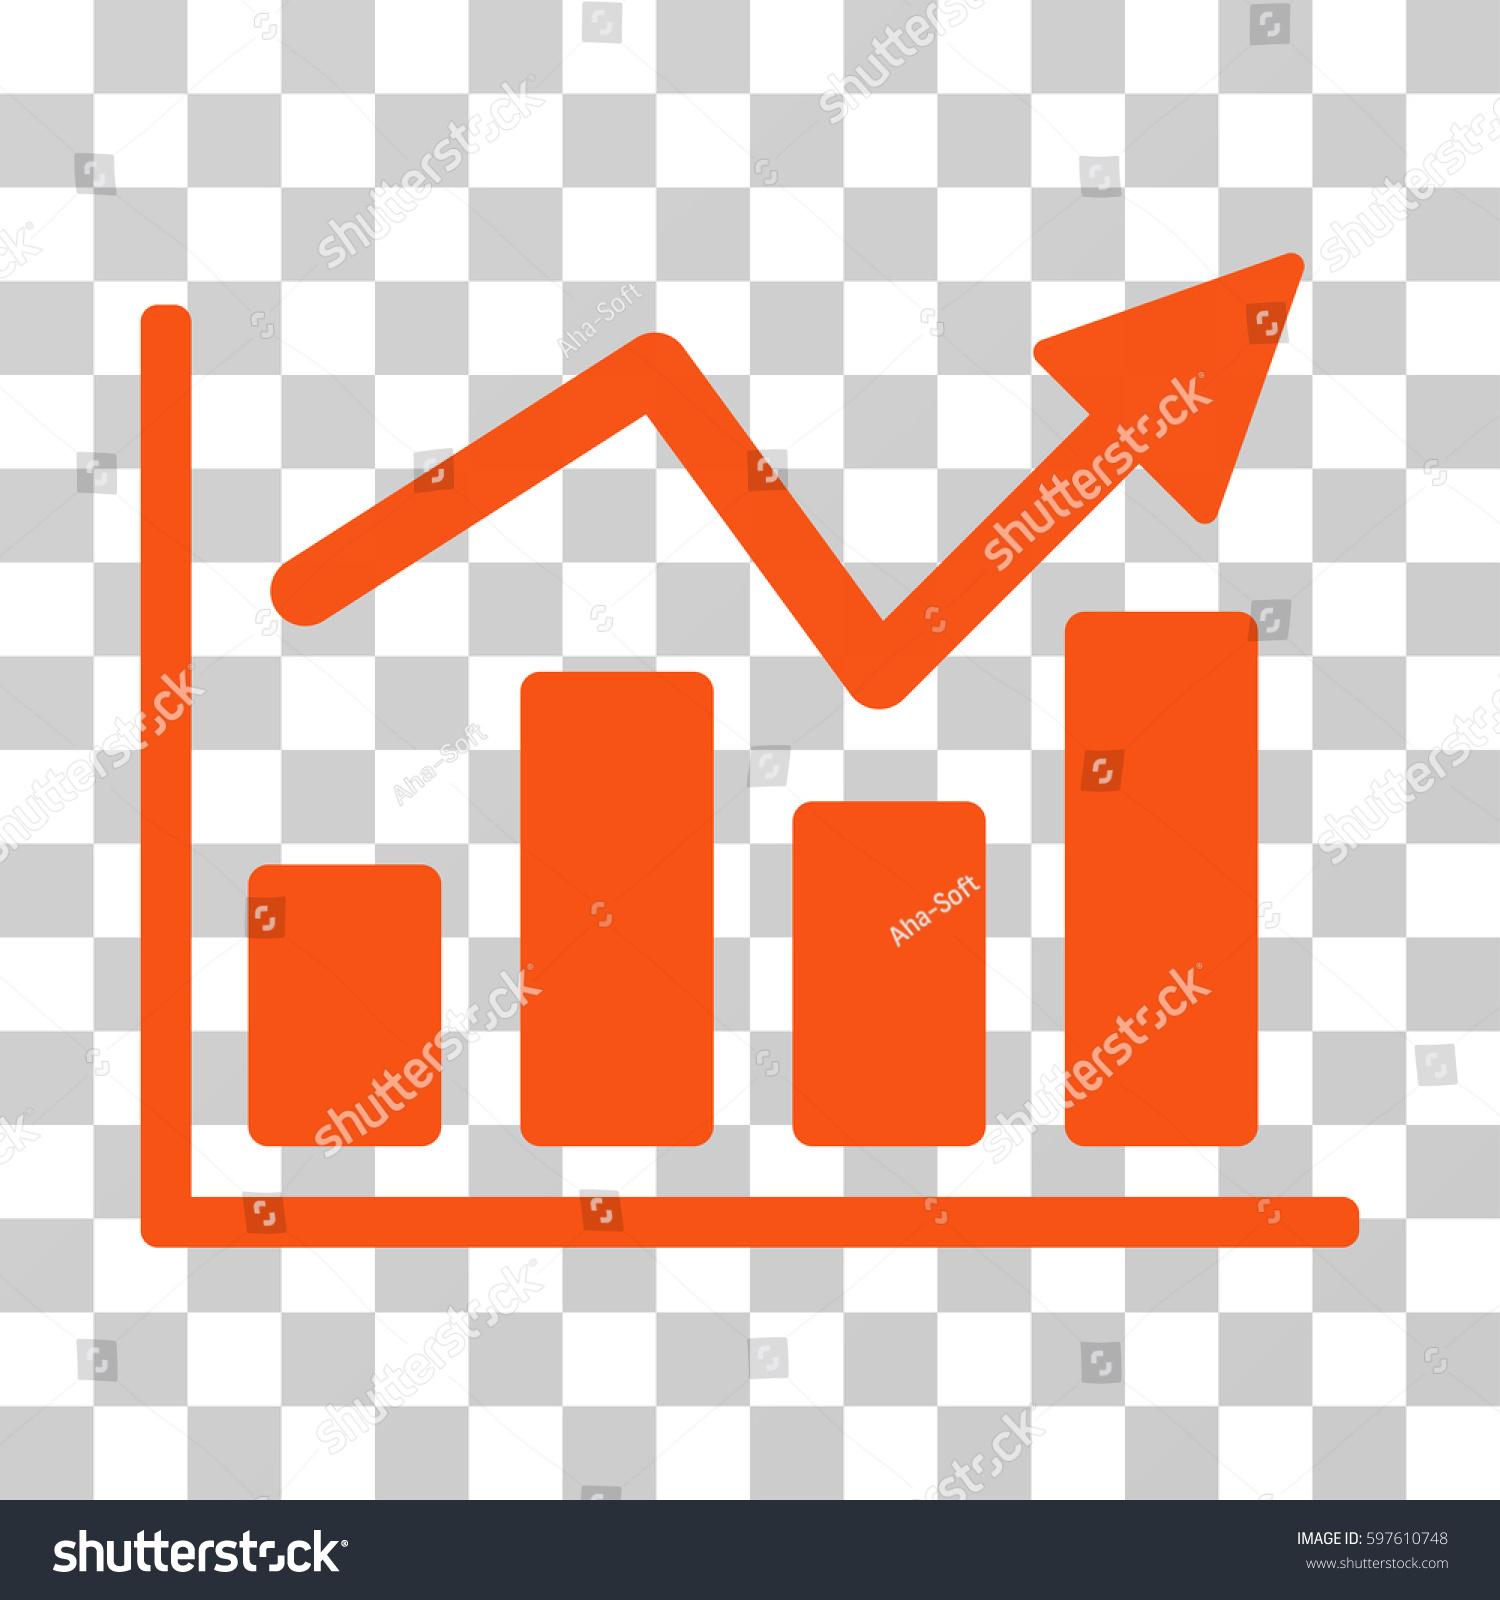 Bar chart trend icon vector illustration stock vector 597610748 bar chart trend icon vector illustration style is flat iconic symbol orange color nvjuhfo Images